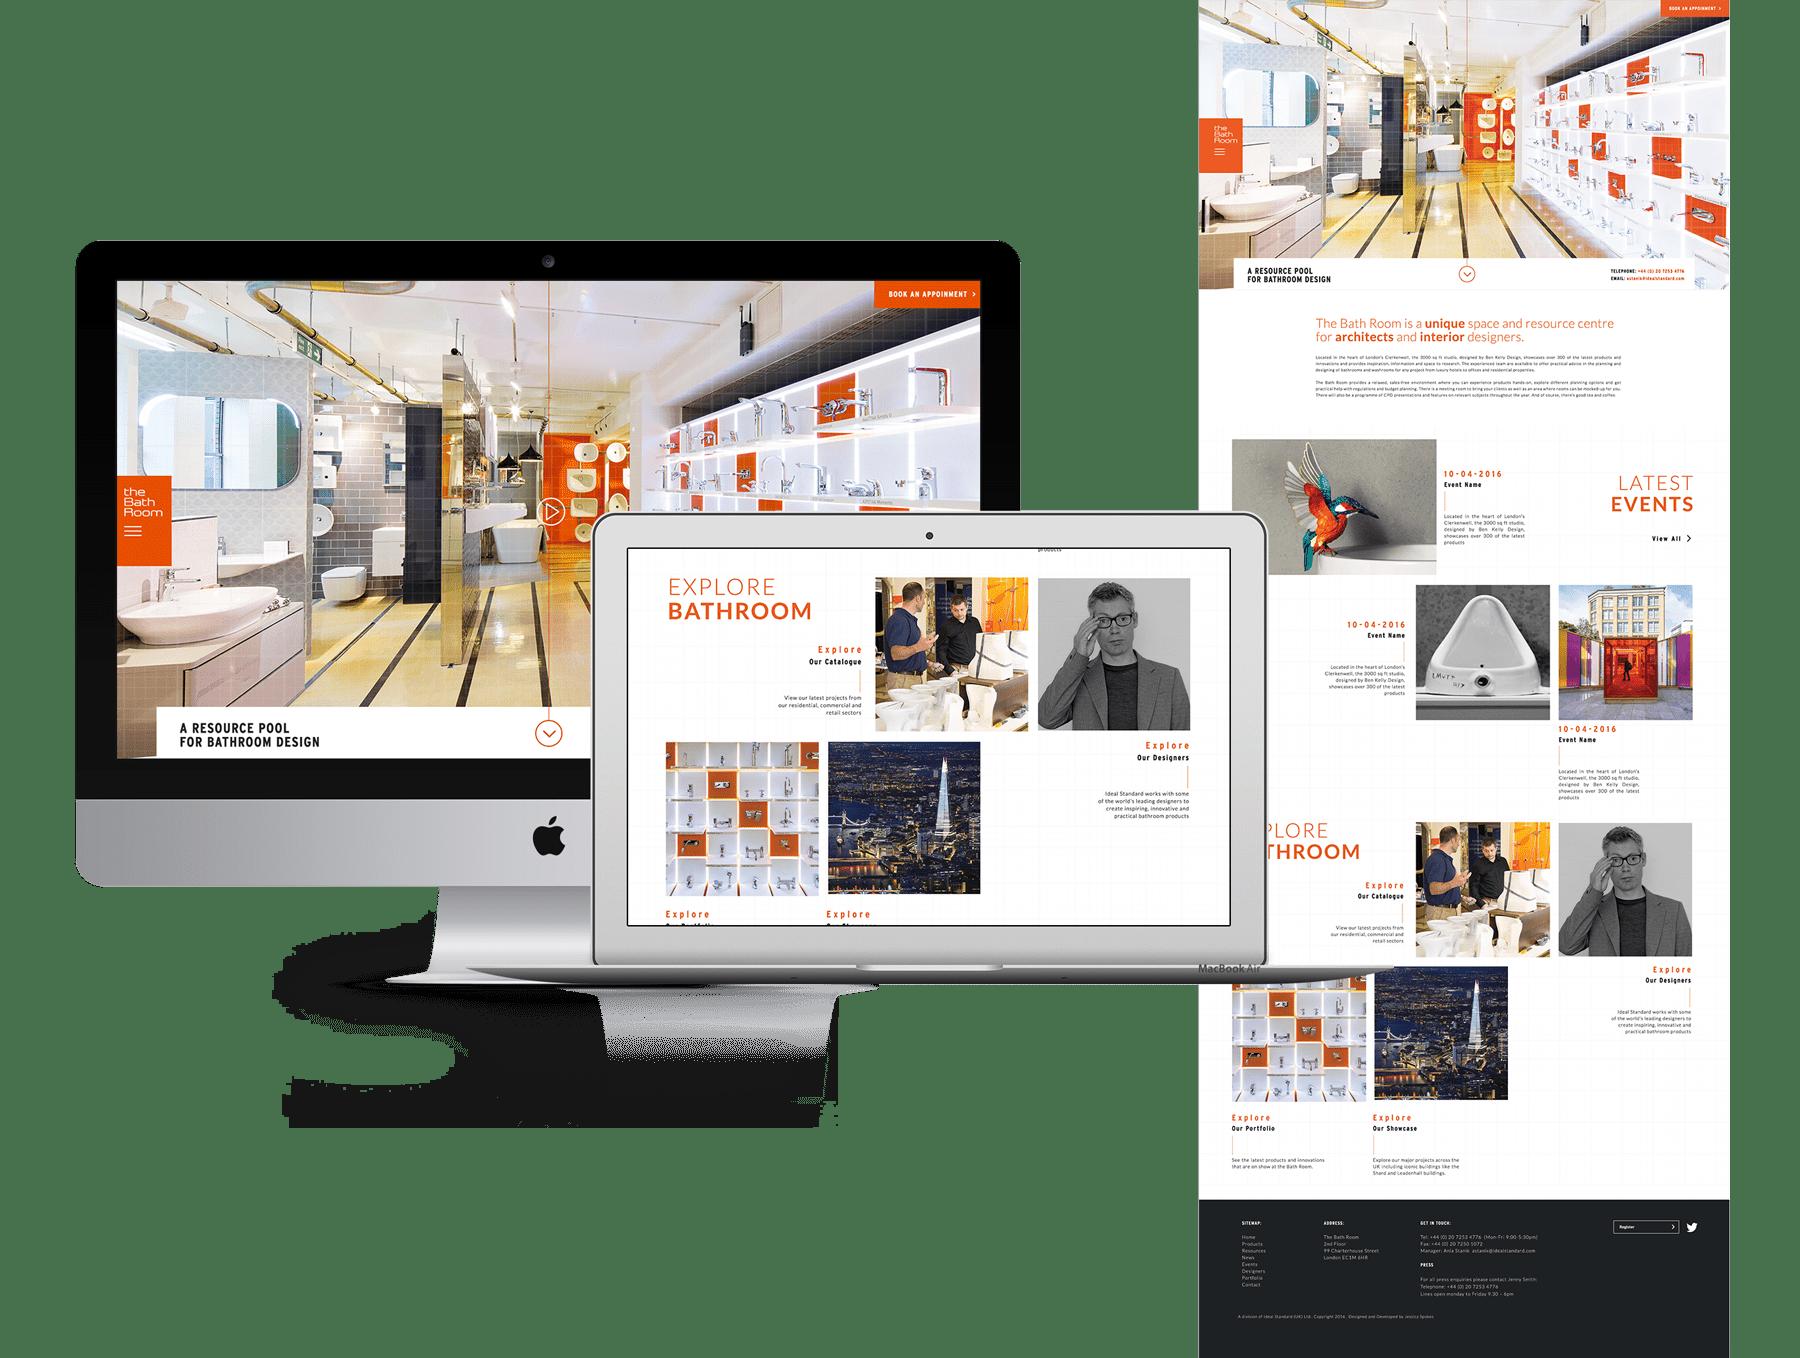 IMGBIN_front-end-web-development-web-design-png_tgn0zePP